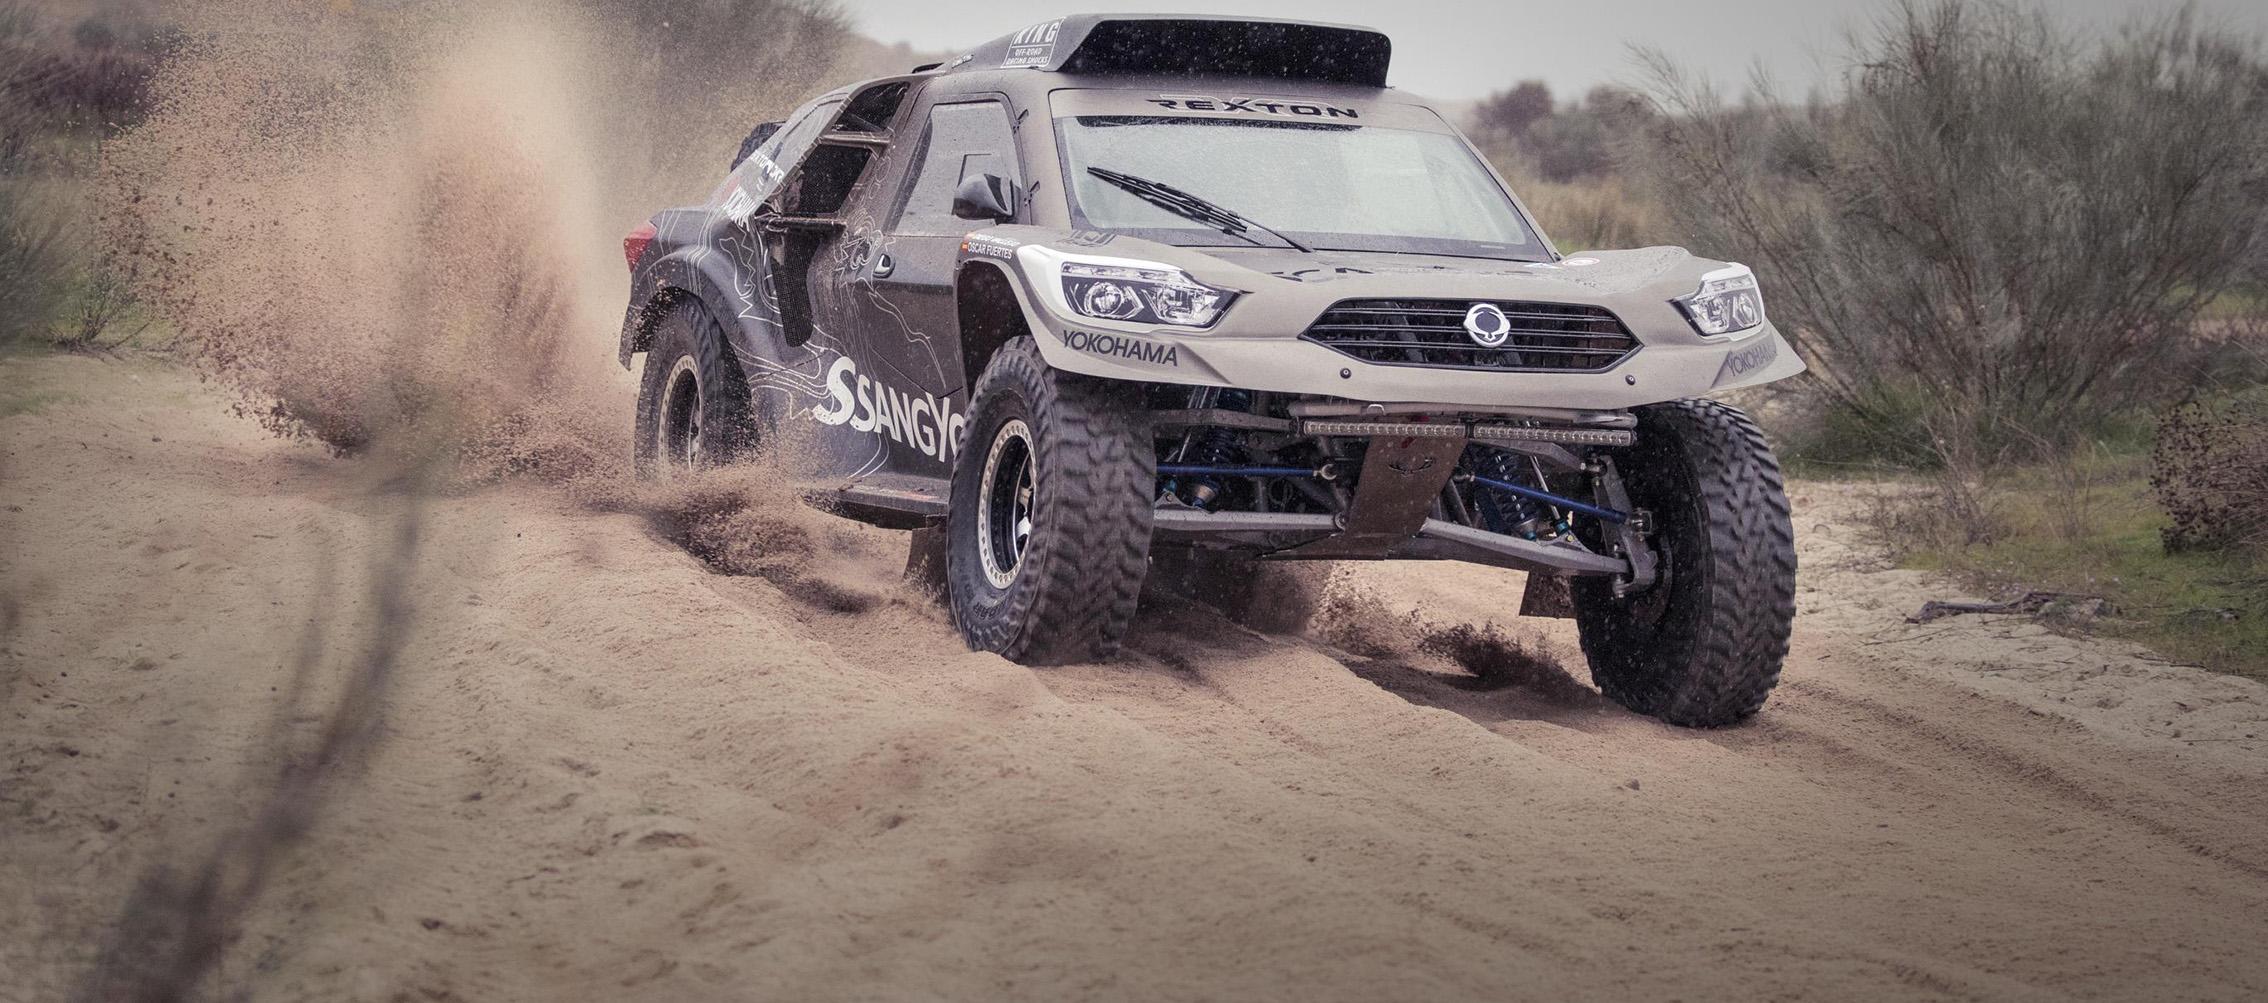 Ssangyong disputará el Dakara 2019 con el Rexton DKR